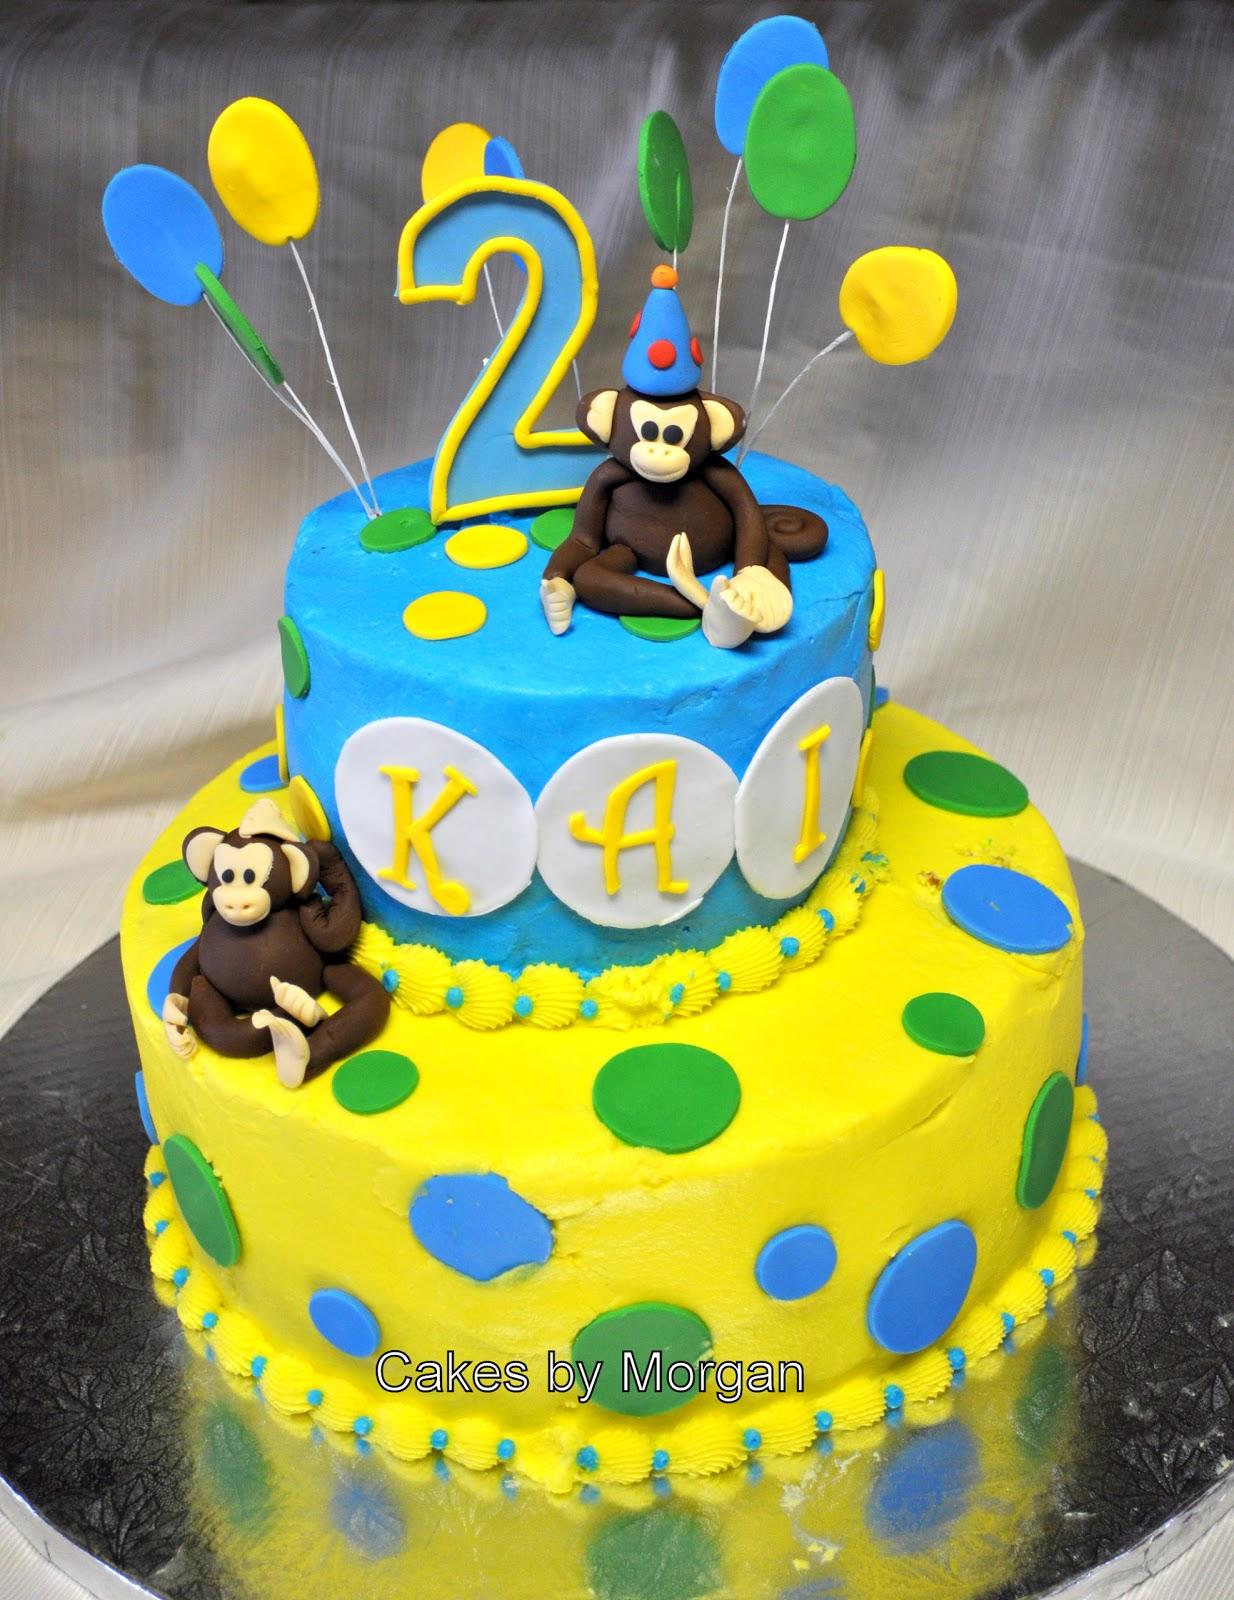 Morgan's Cakes: Monkey Cake